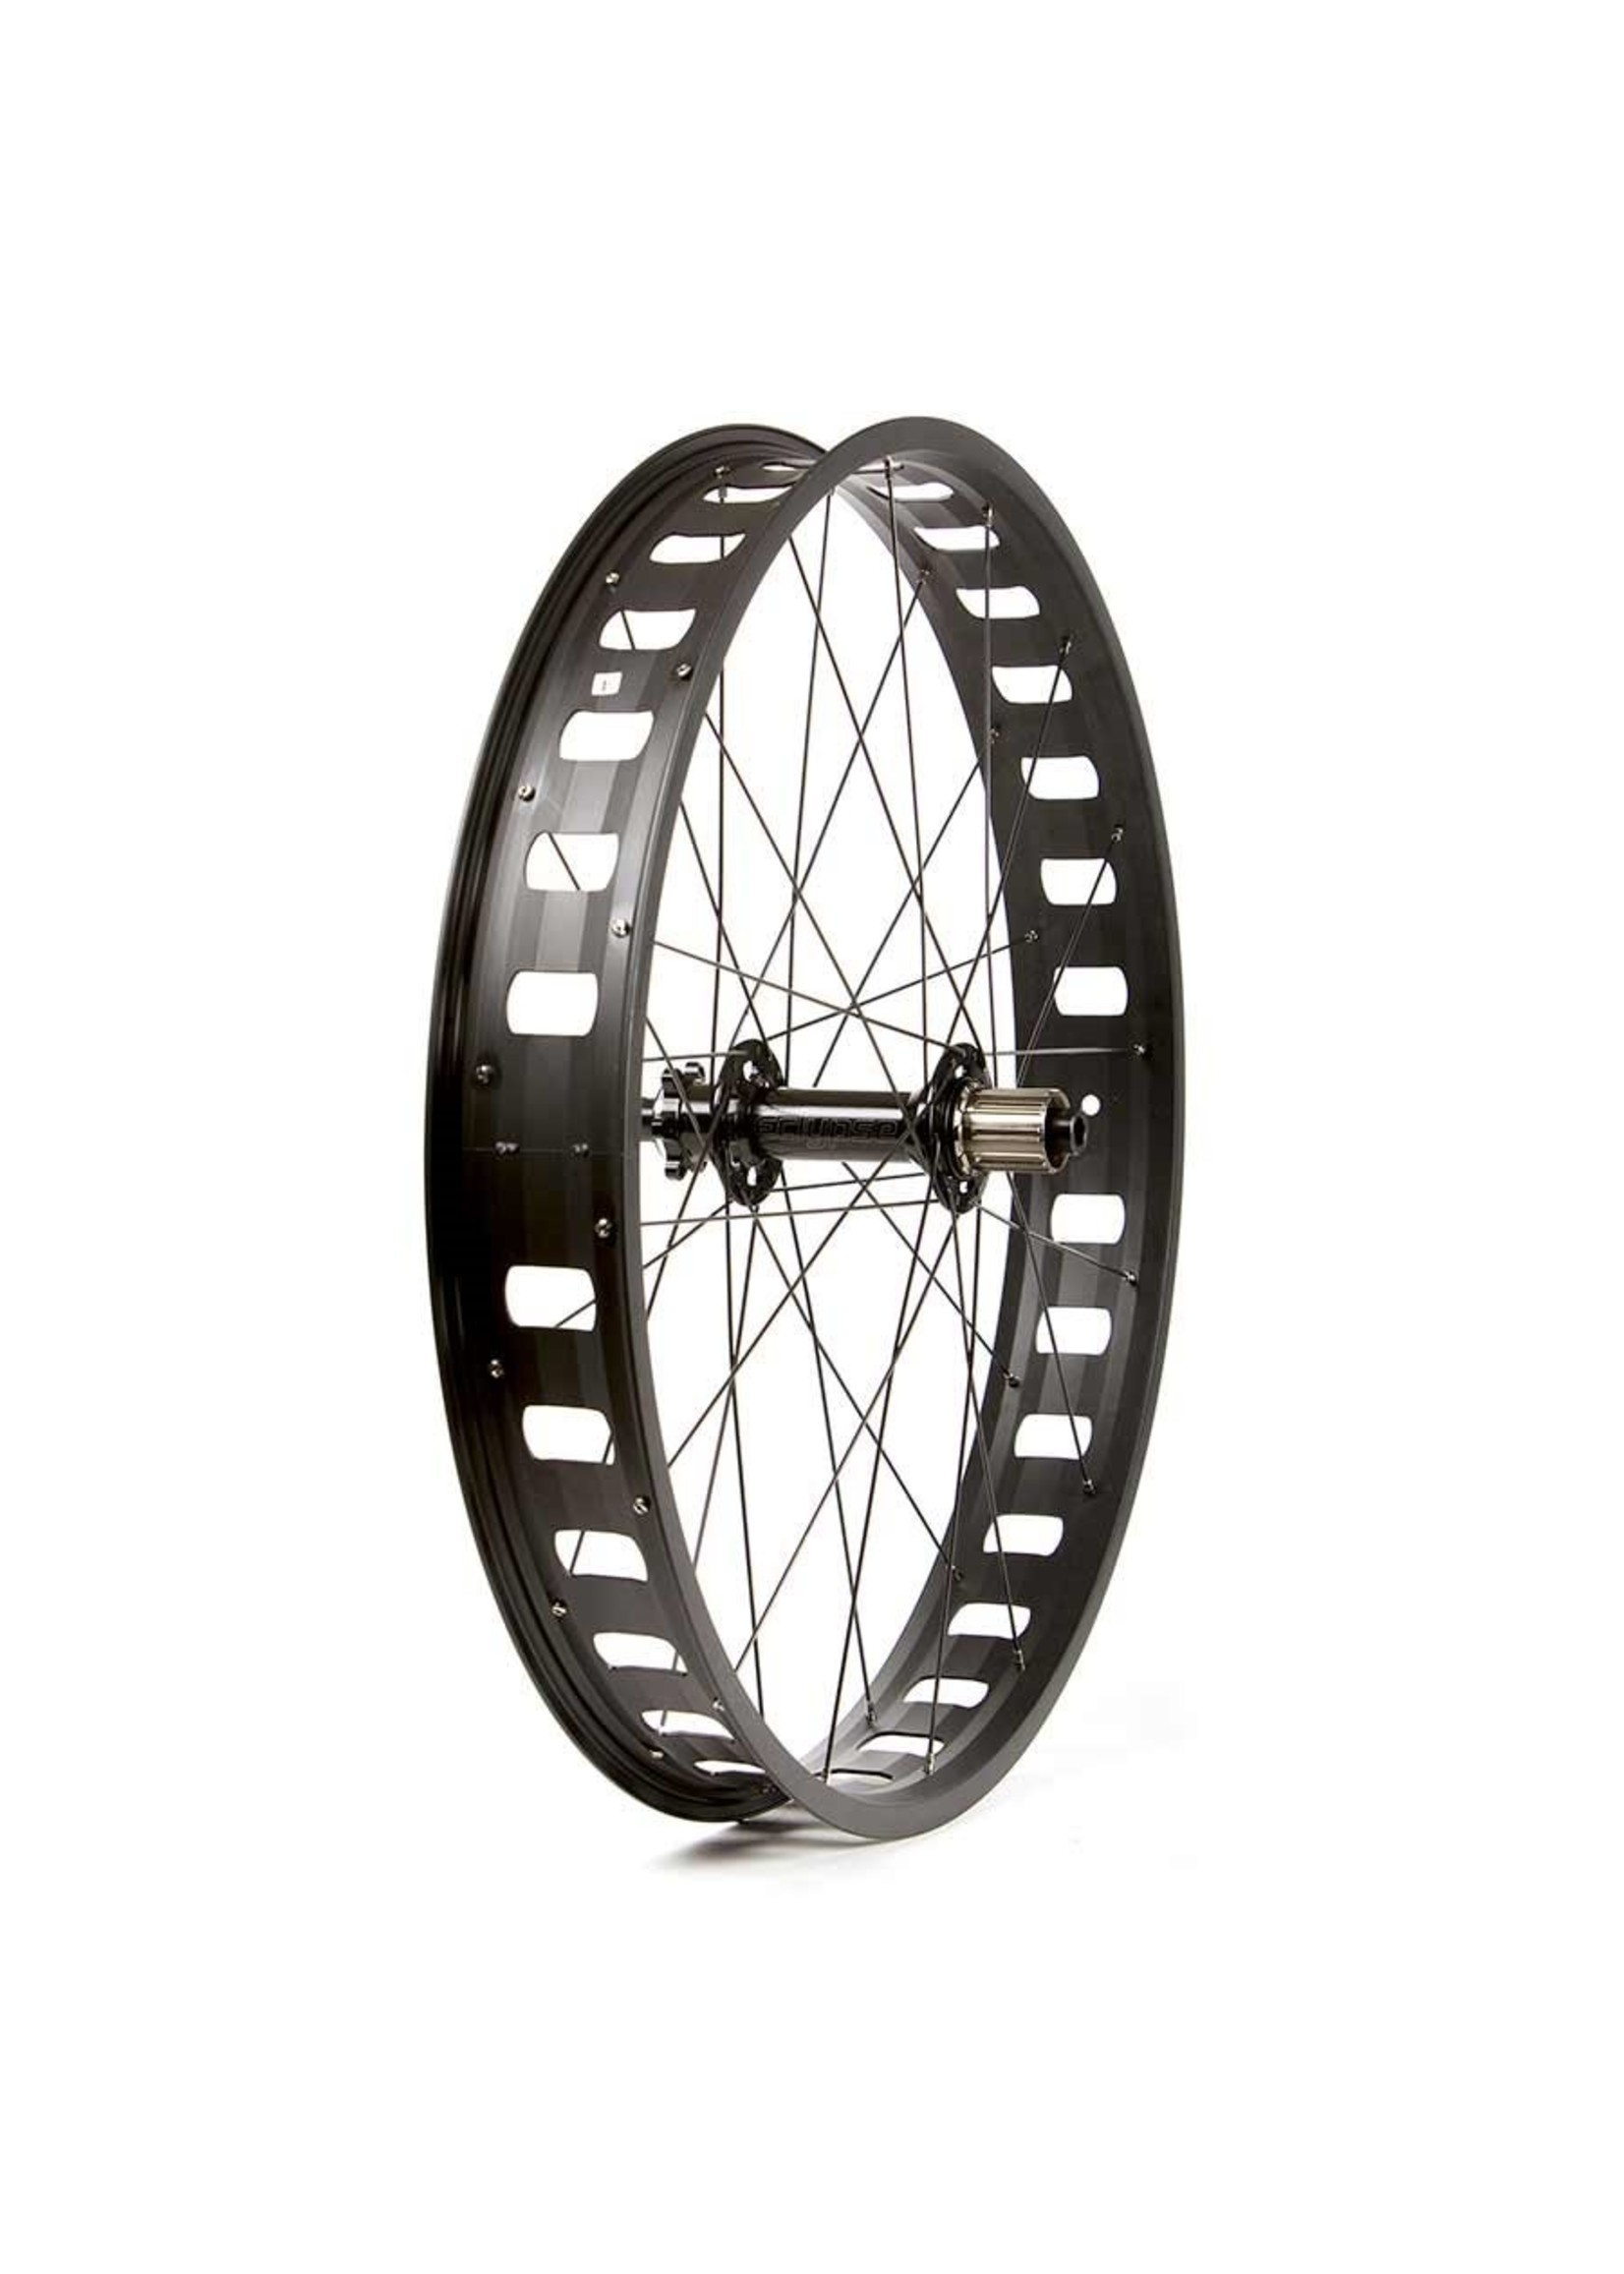 Wheel Shop, Evo JP73 Black/ Novatec D202SB, Wheel, Rear, 26'' / 559, Holes: 32, 12mm TA, 197mm, Disc IS 6-bolt, Shimano HG